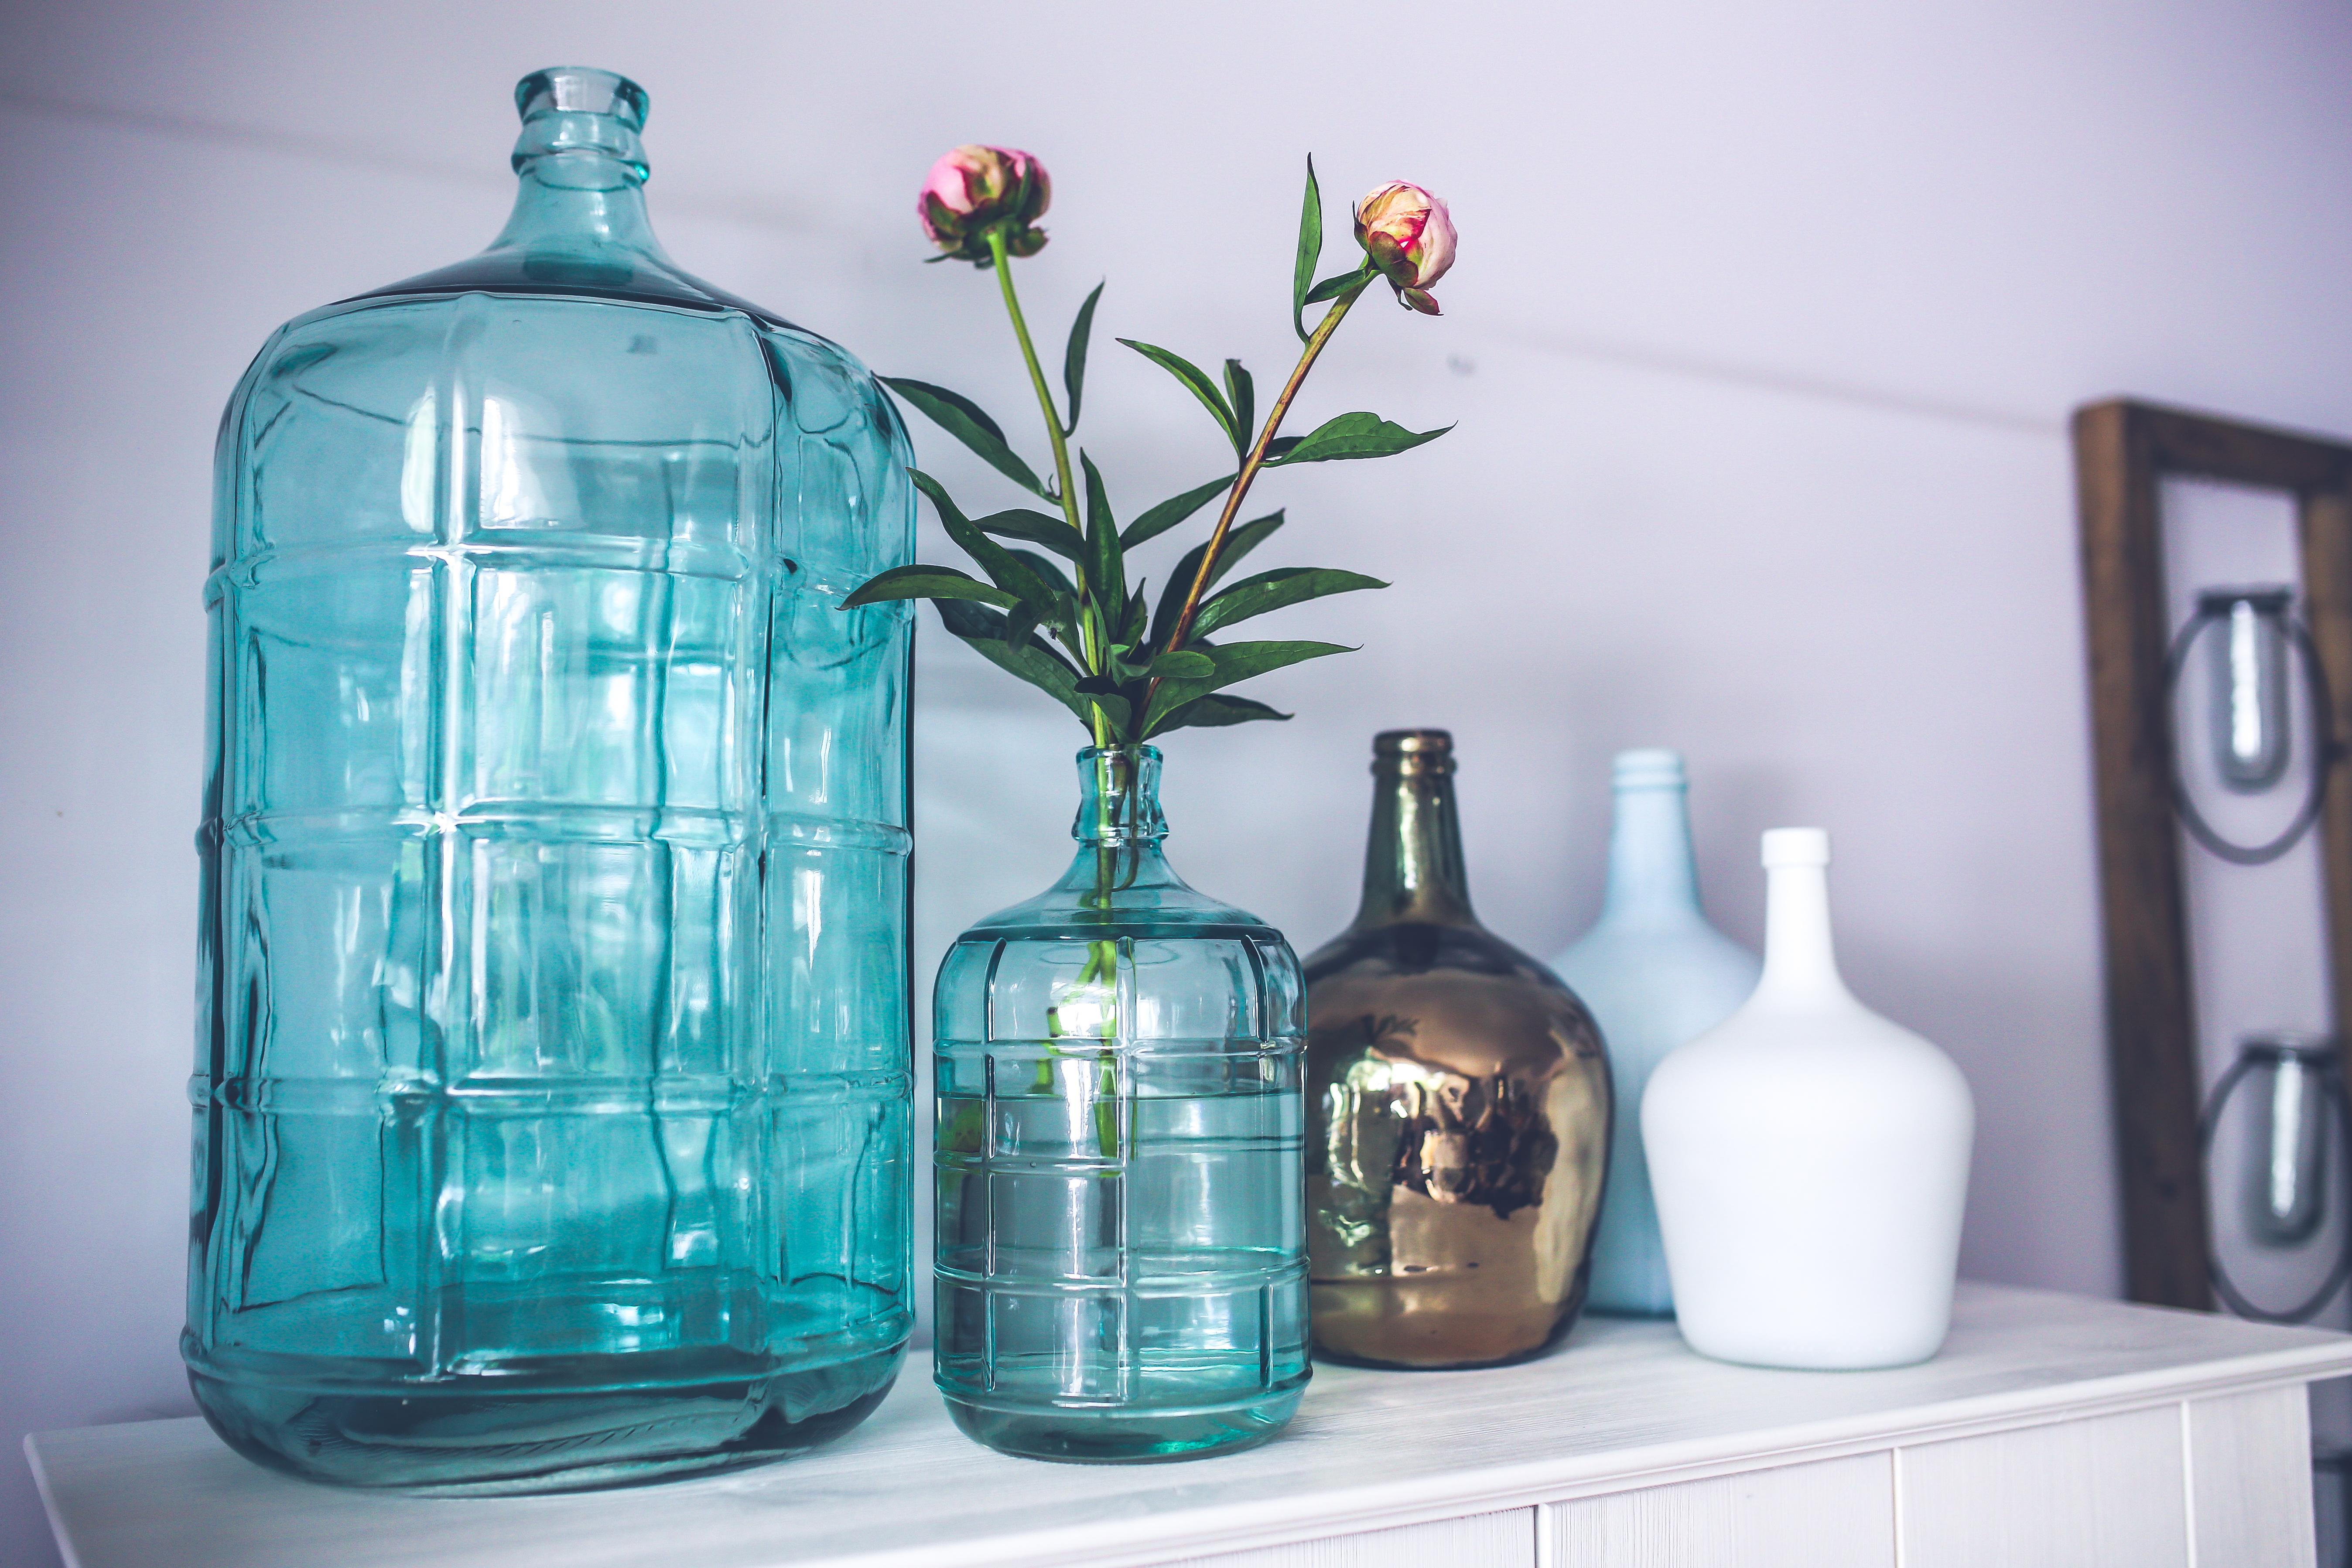 blue-glass-flower-decoration.jpg